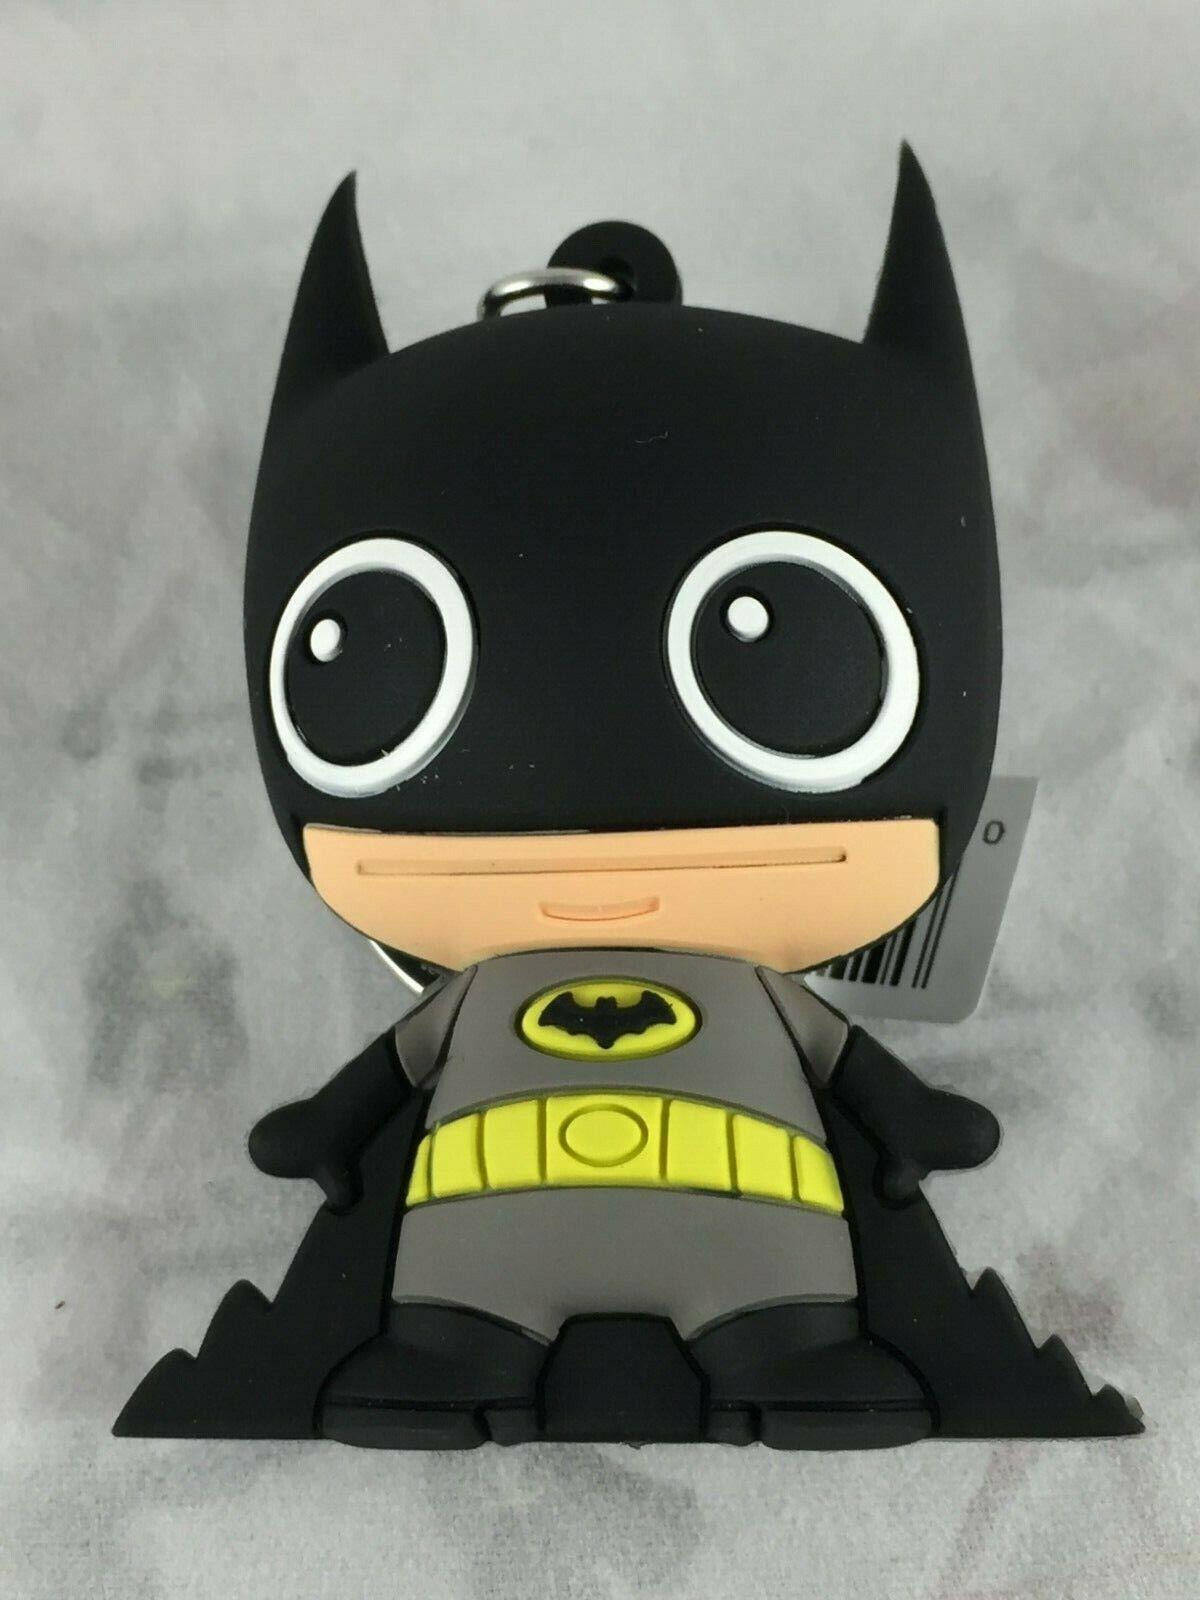 DC Comics Figural Keyring Key Chain Blind Bag Superhero Choose Series 2 NEW!